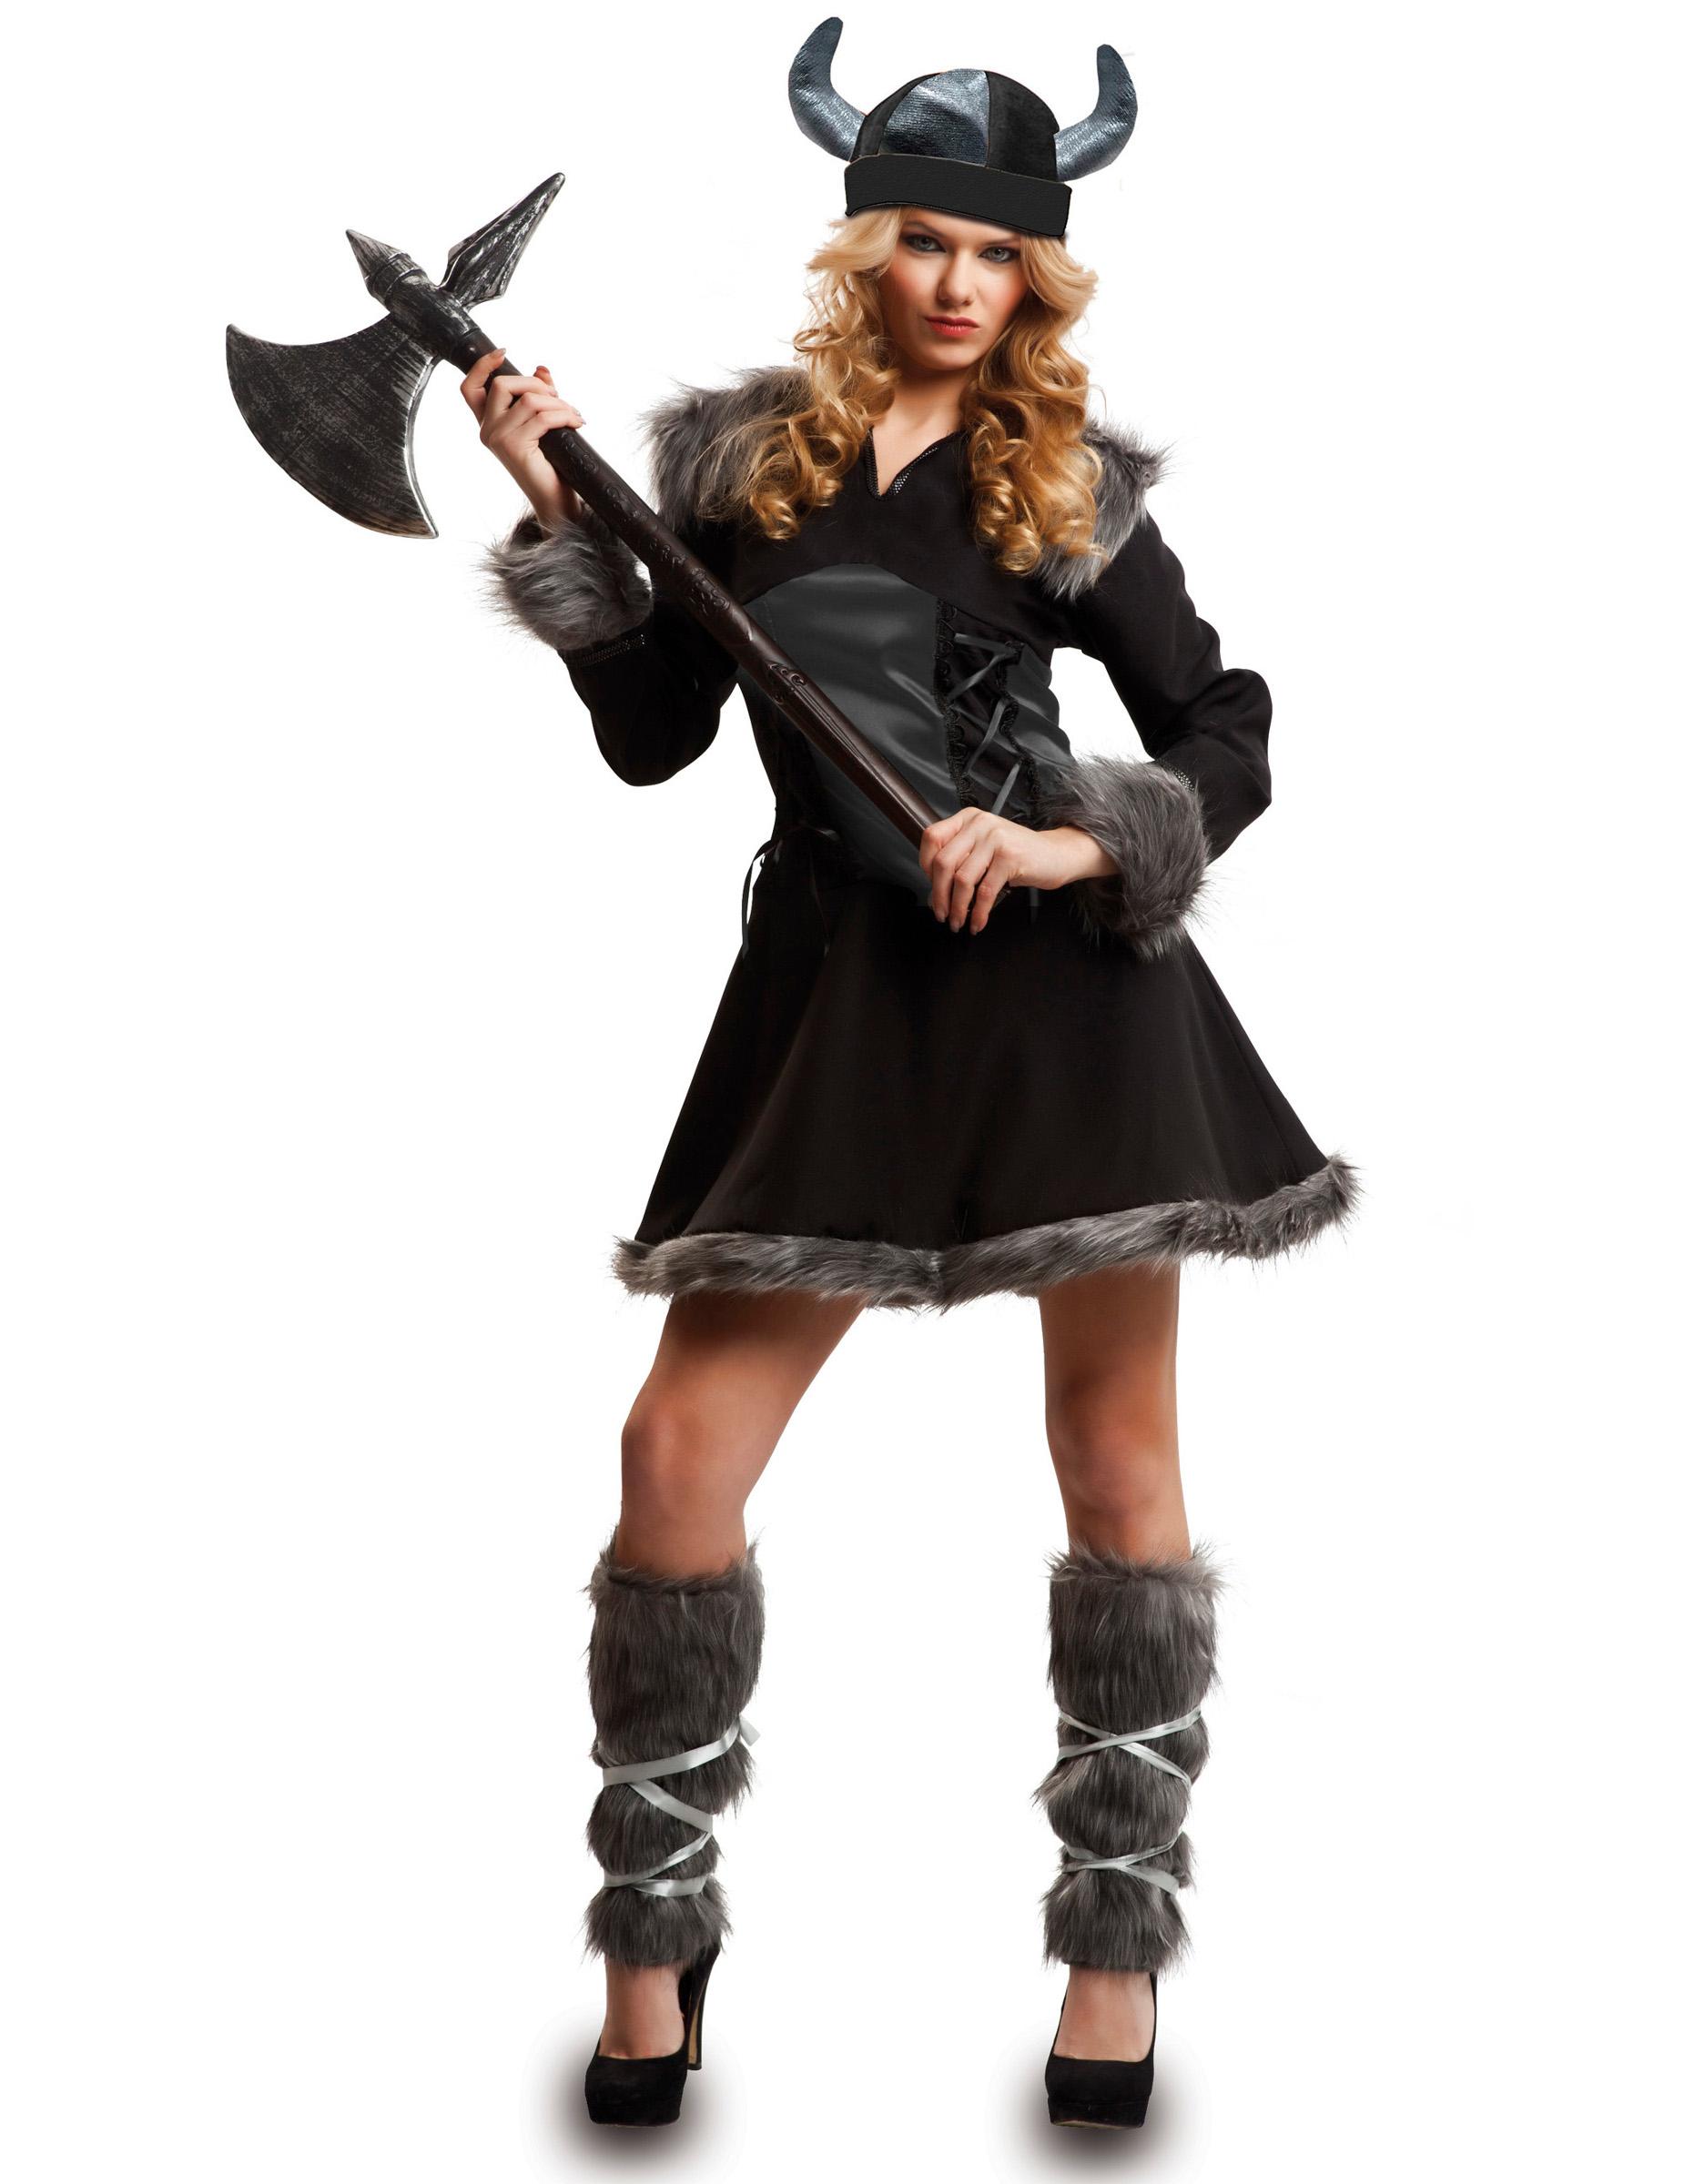 Kostum Wikingerin Fur Damen Schwarz Gunstige Faschings Kostume Bei